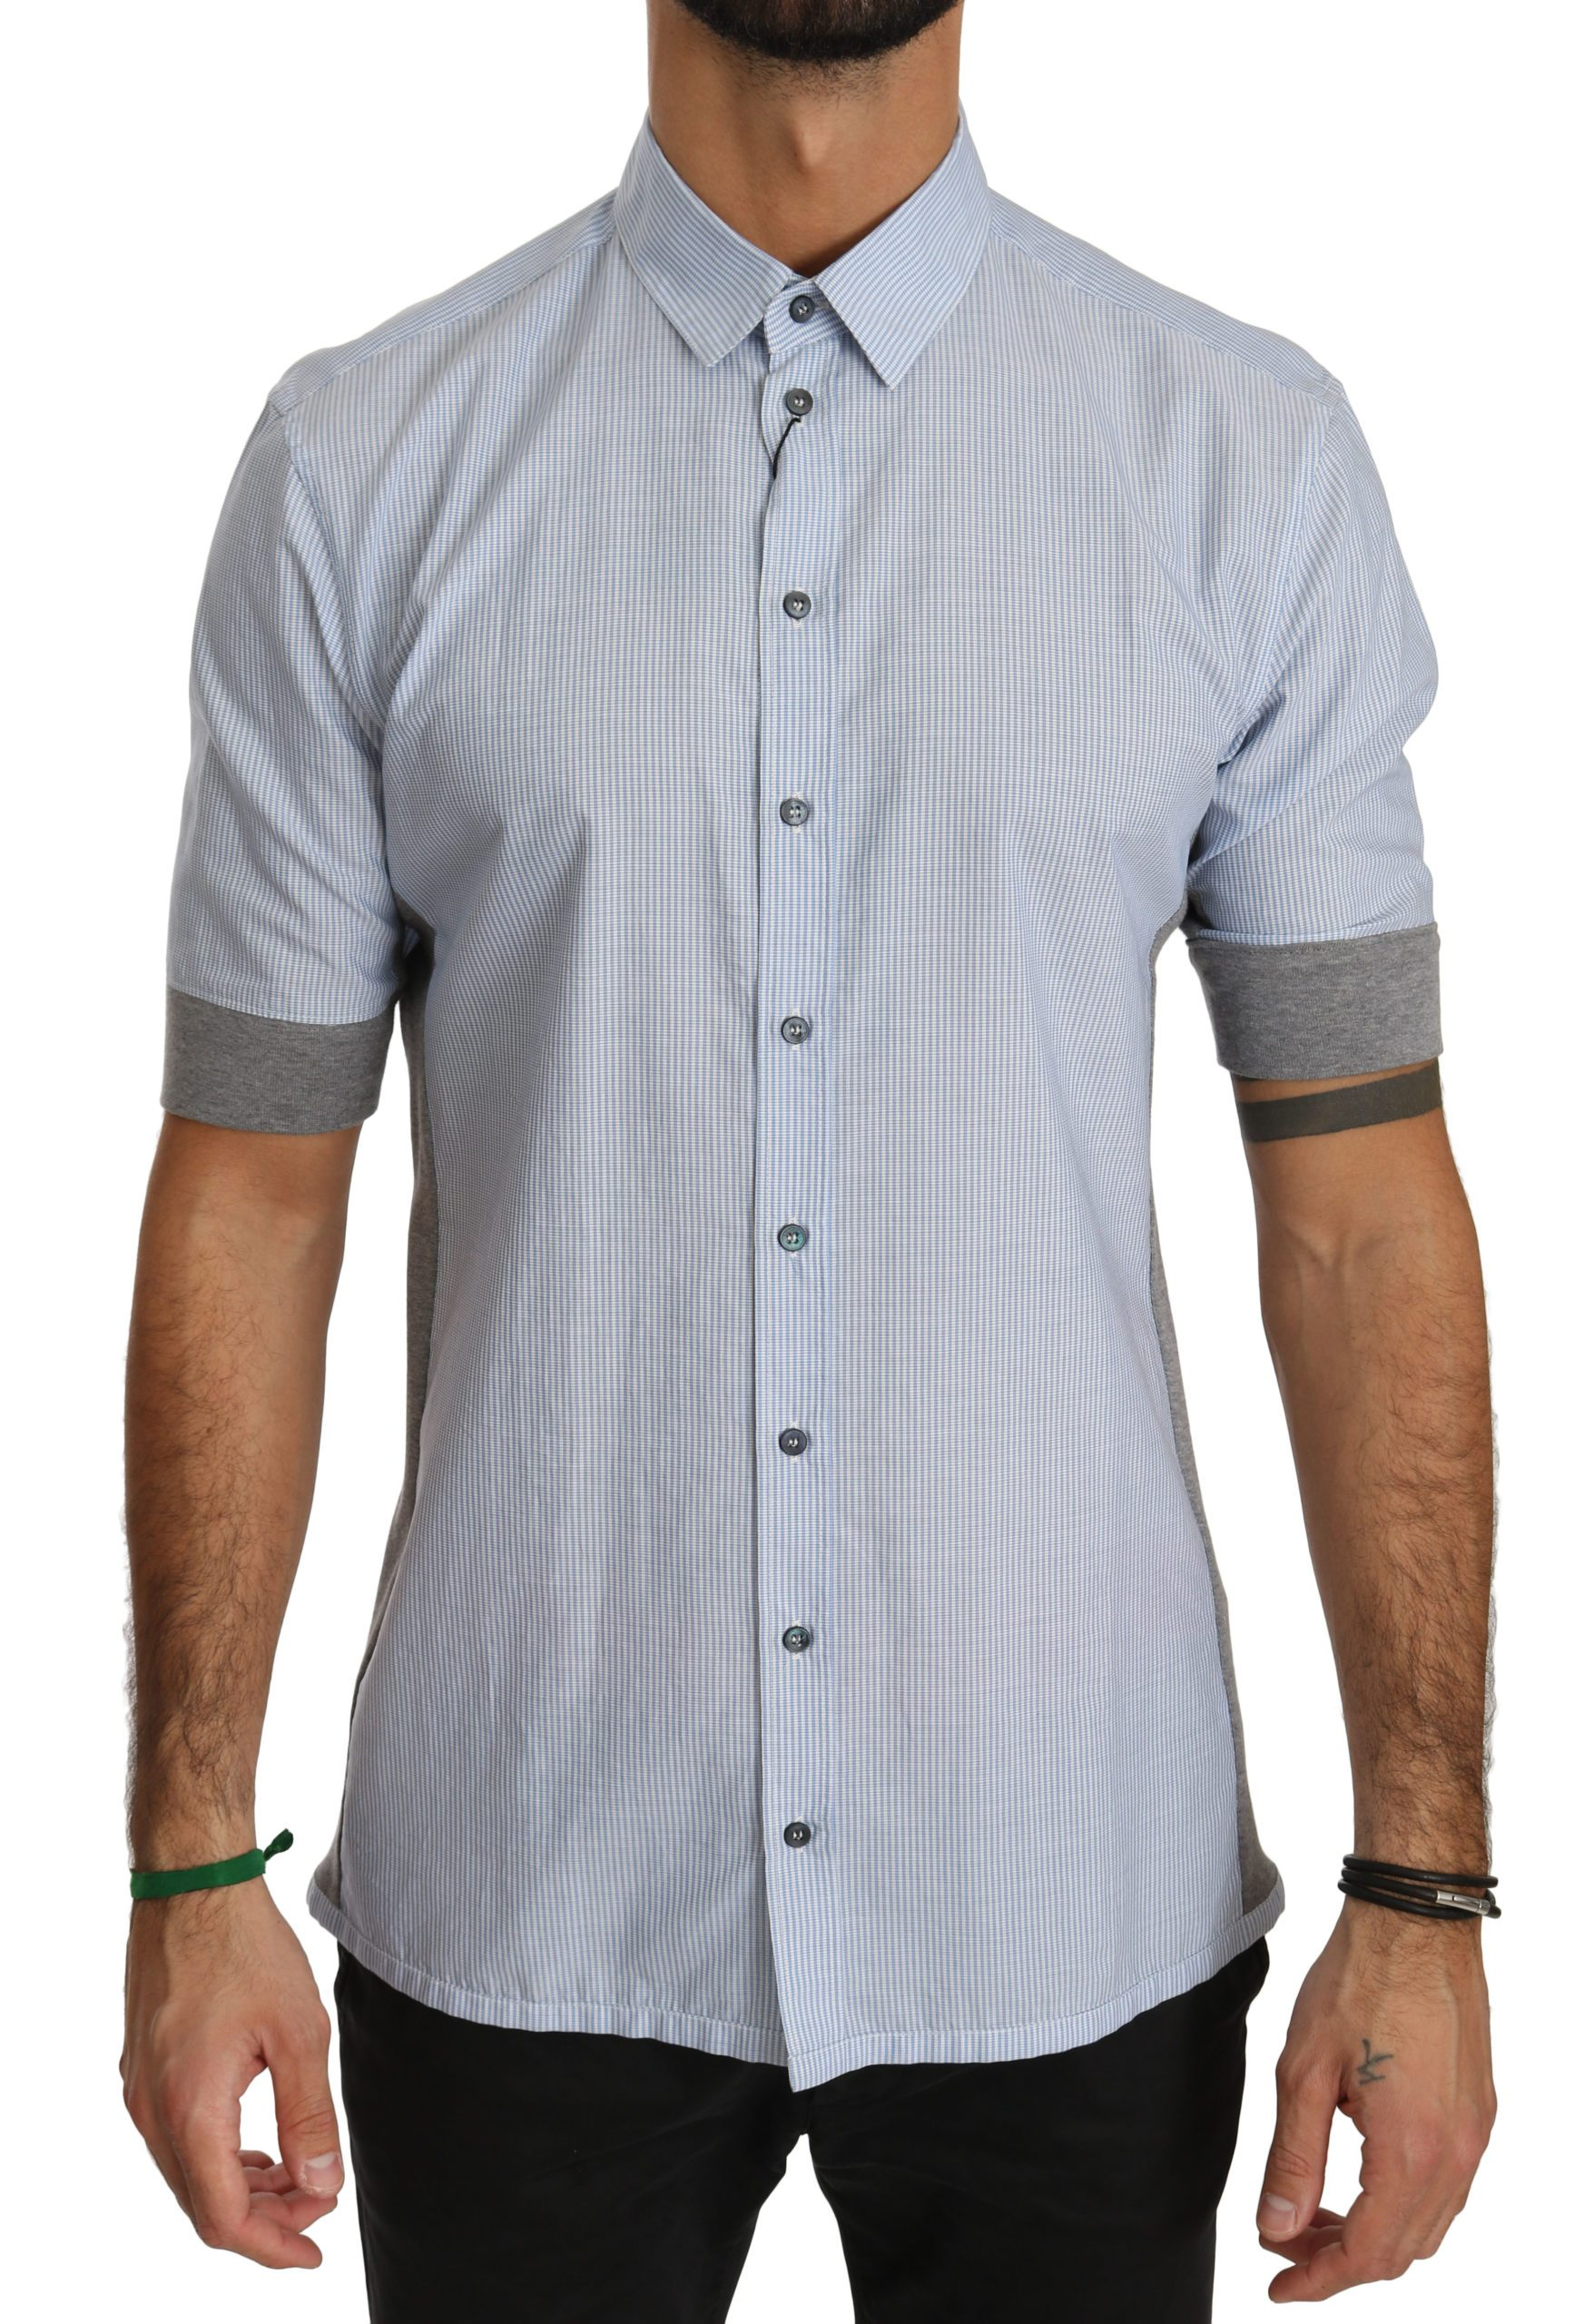 Dolce & Gabbana Men's Short Sleeve Shirt Blue TSH4019 - IT40 | M